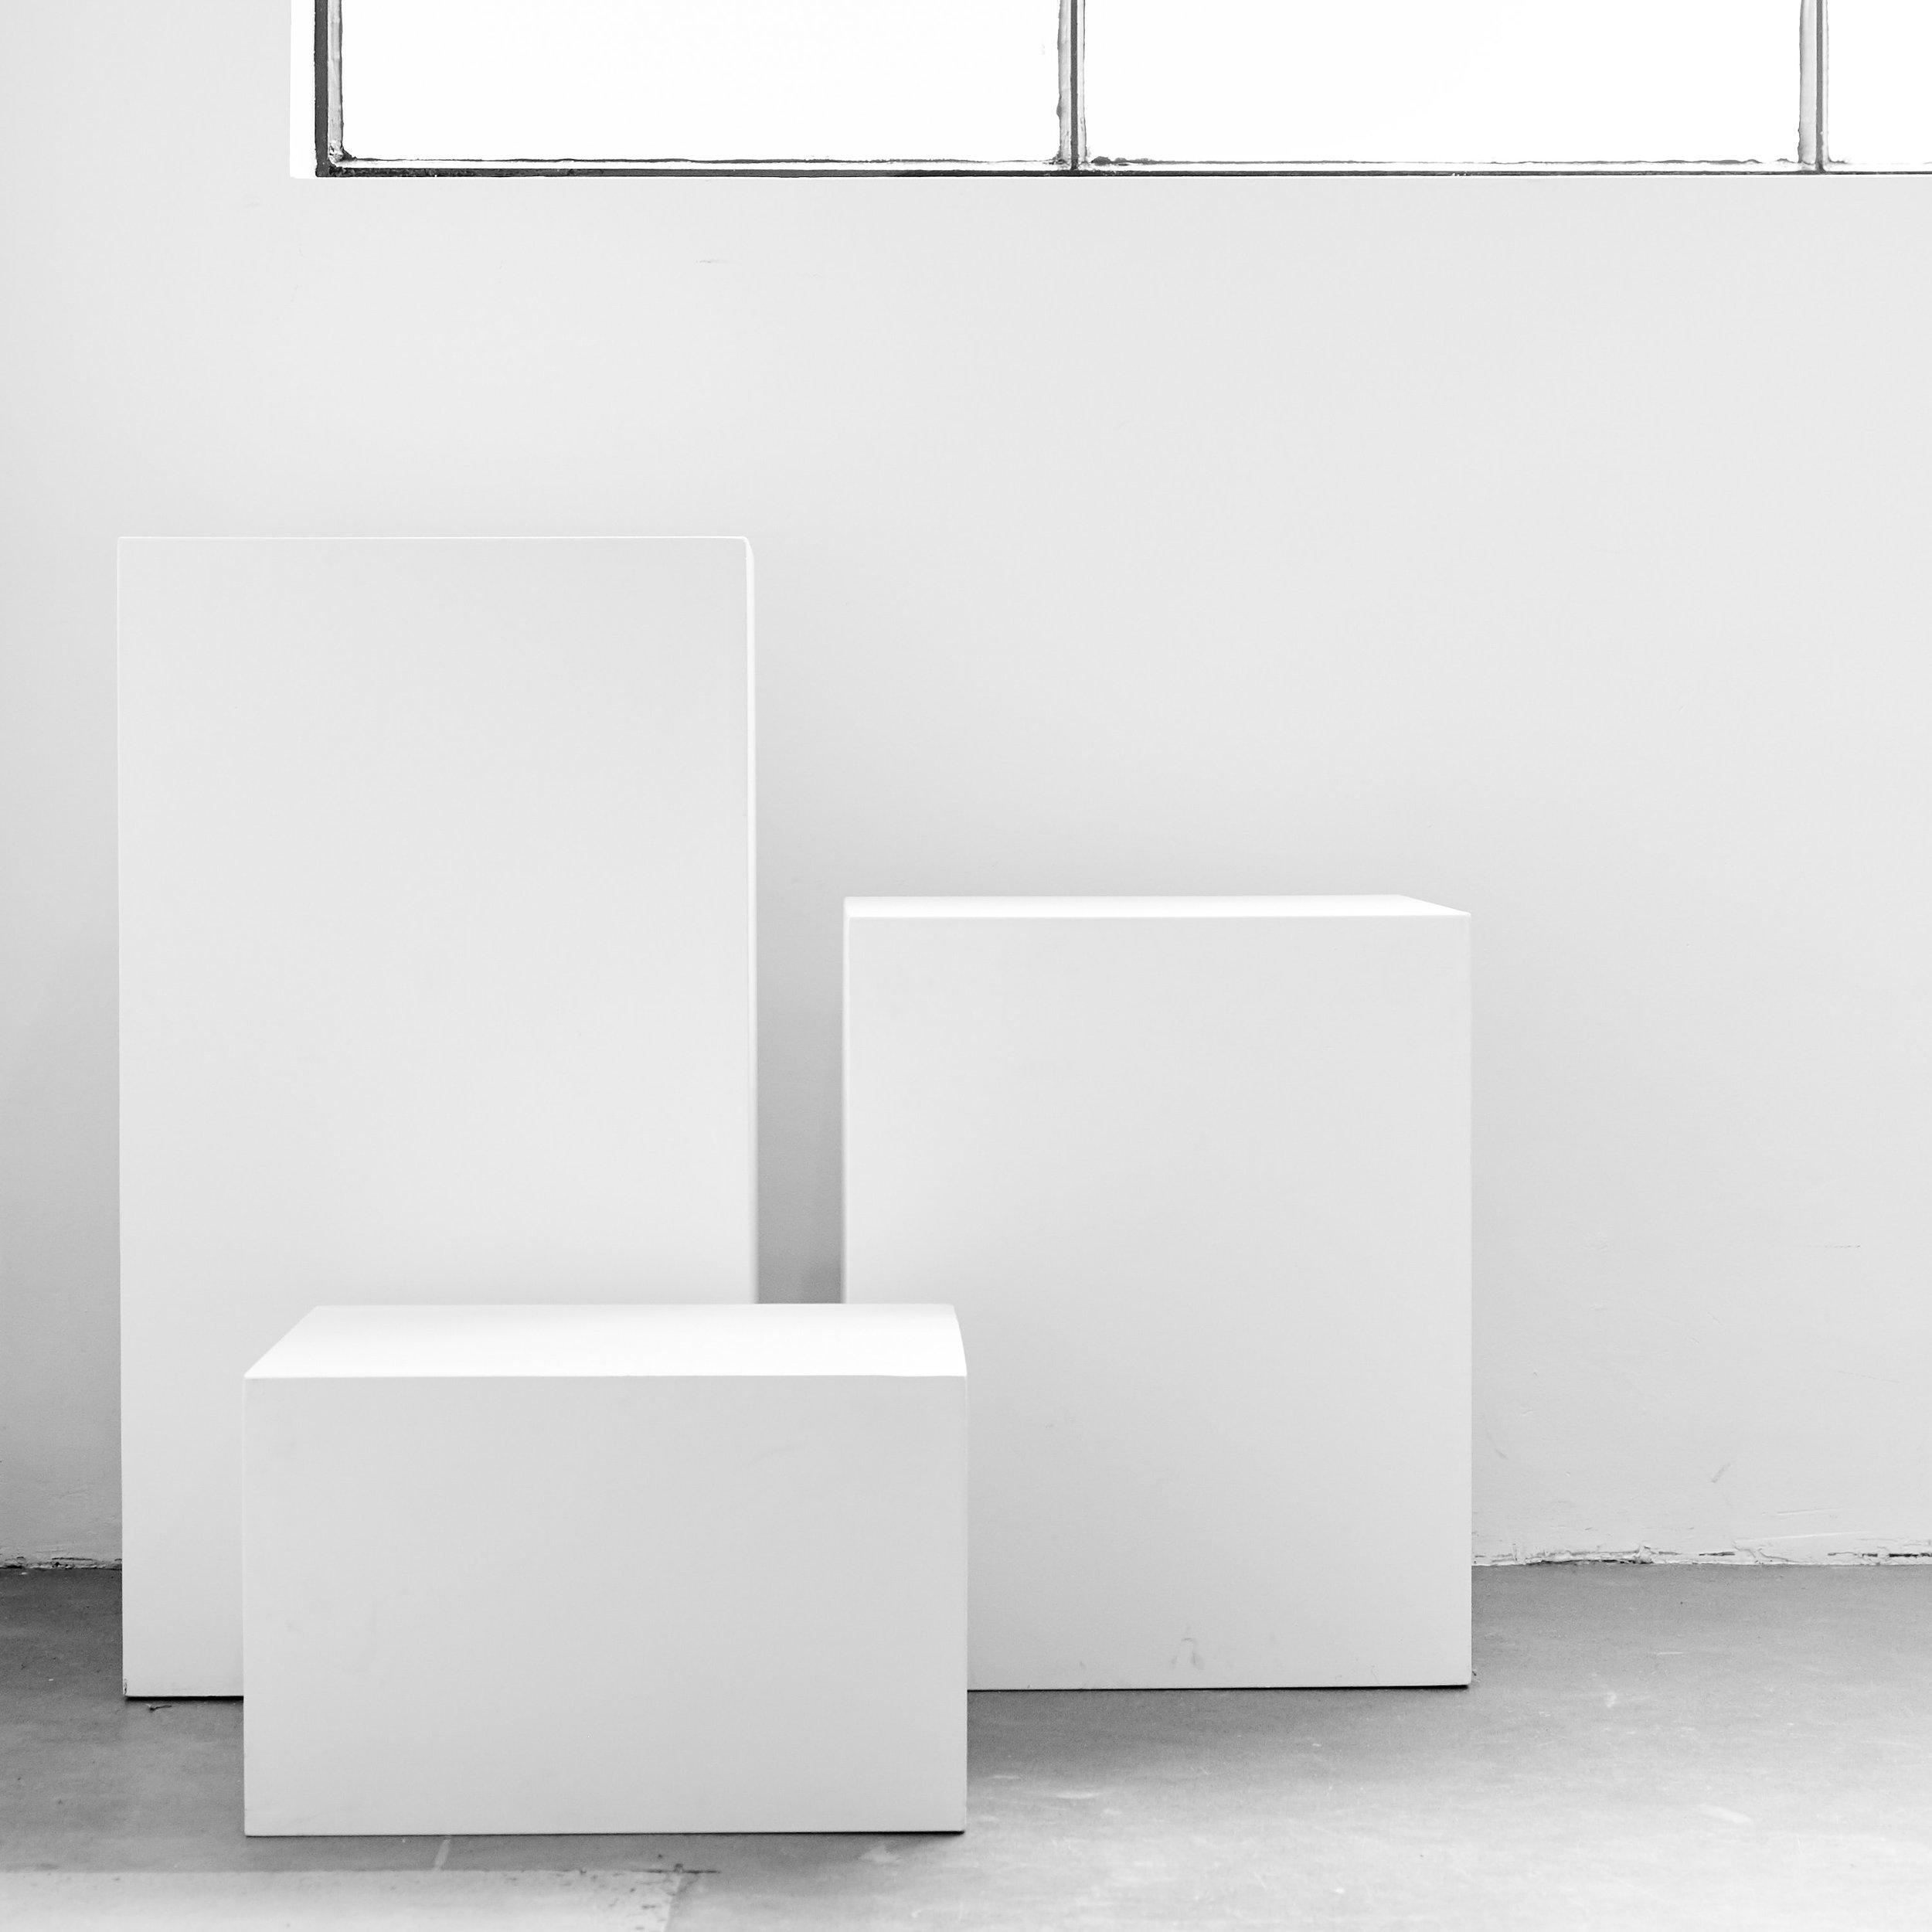 photography studio northcote white boxes